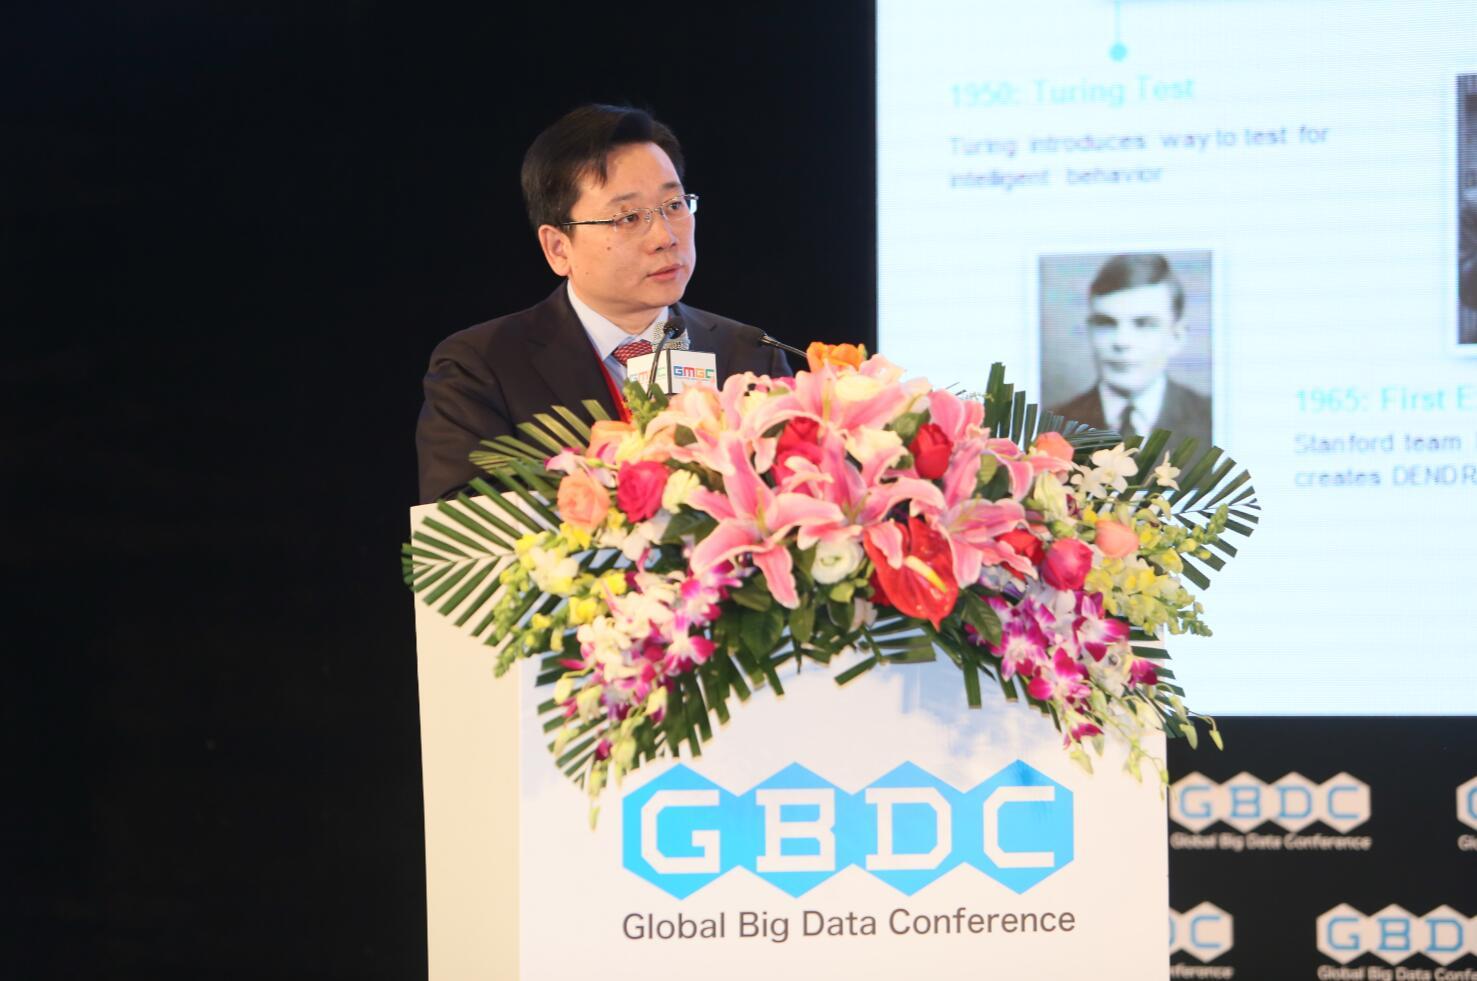 GBDC2016IBM分析开发总经理吉燕勇:认知计算-通往智慧之路